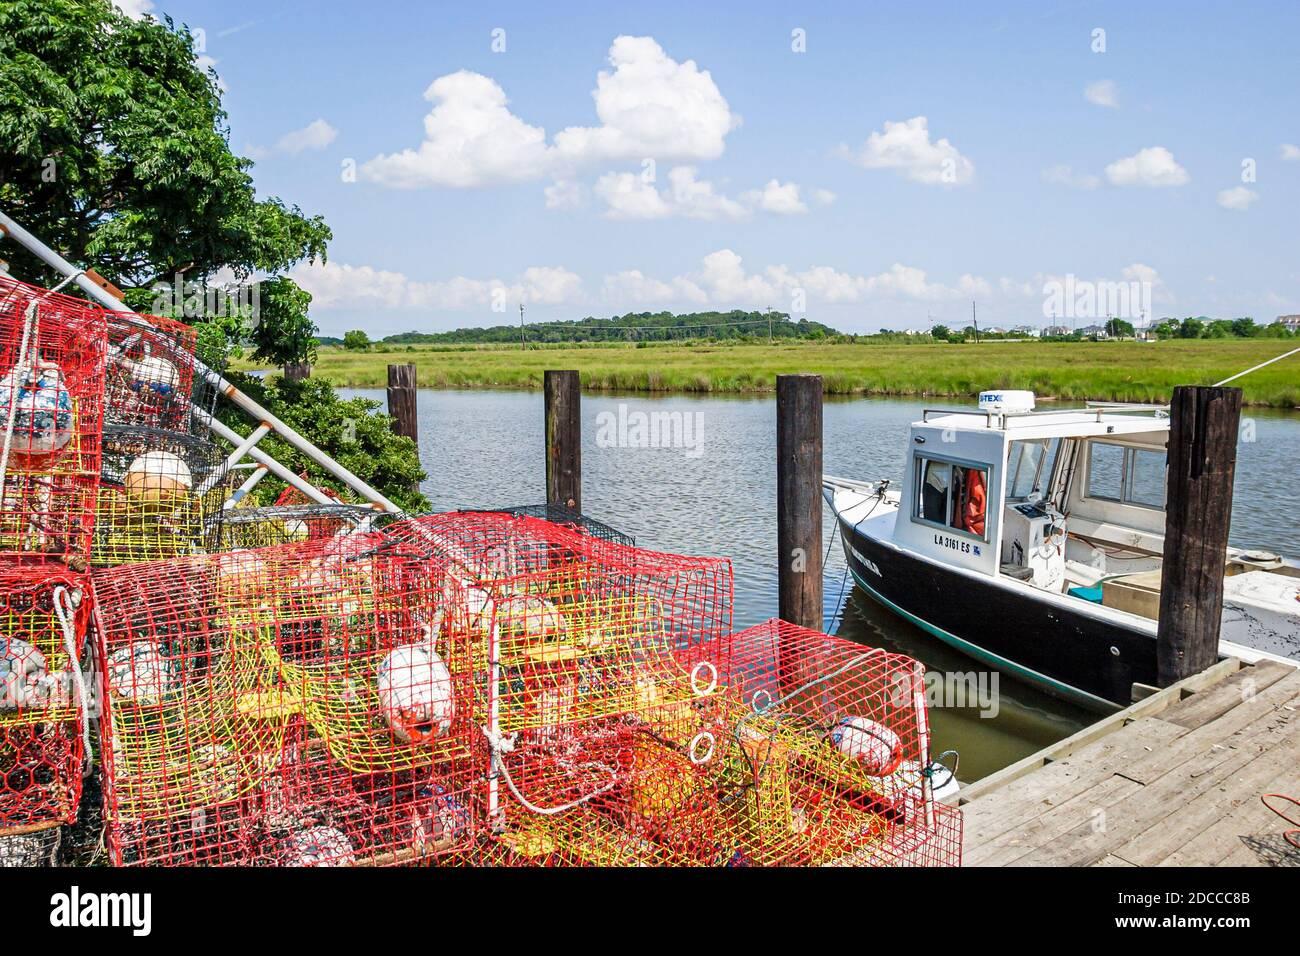 Louisiana St. Tammany Parish Northshore, Slidell Salt Bayou crab traps commercial crabbing boat, Stock Photo